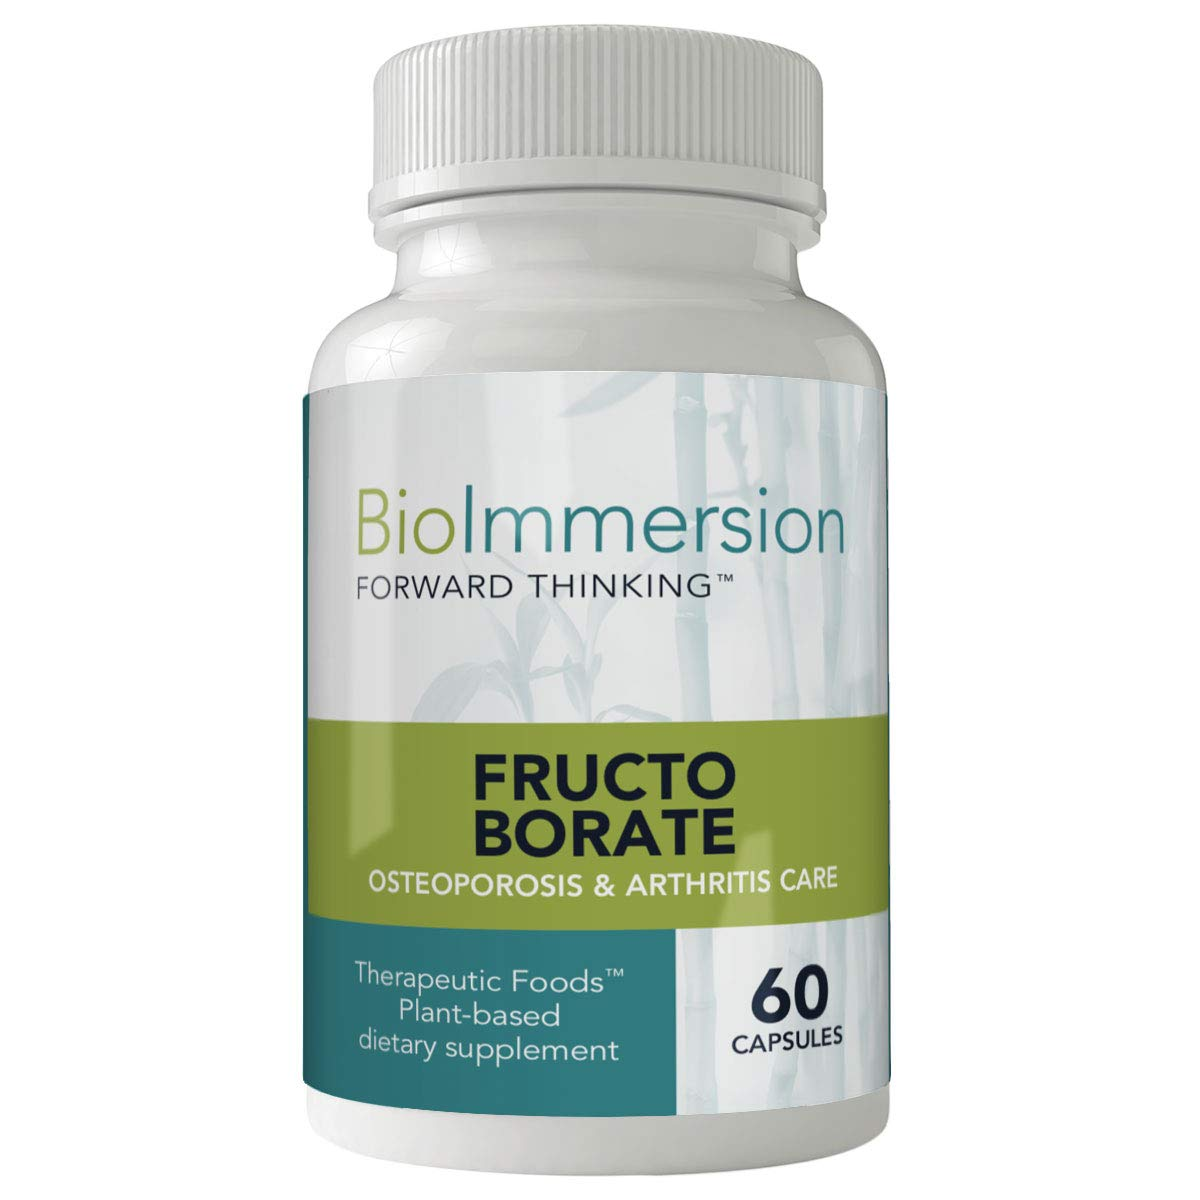 BioImmersion - Fructo Borate Complex - Natural food form of bio-available boron - 60 Capsules